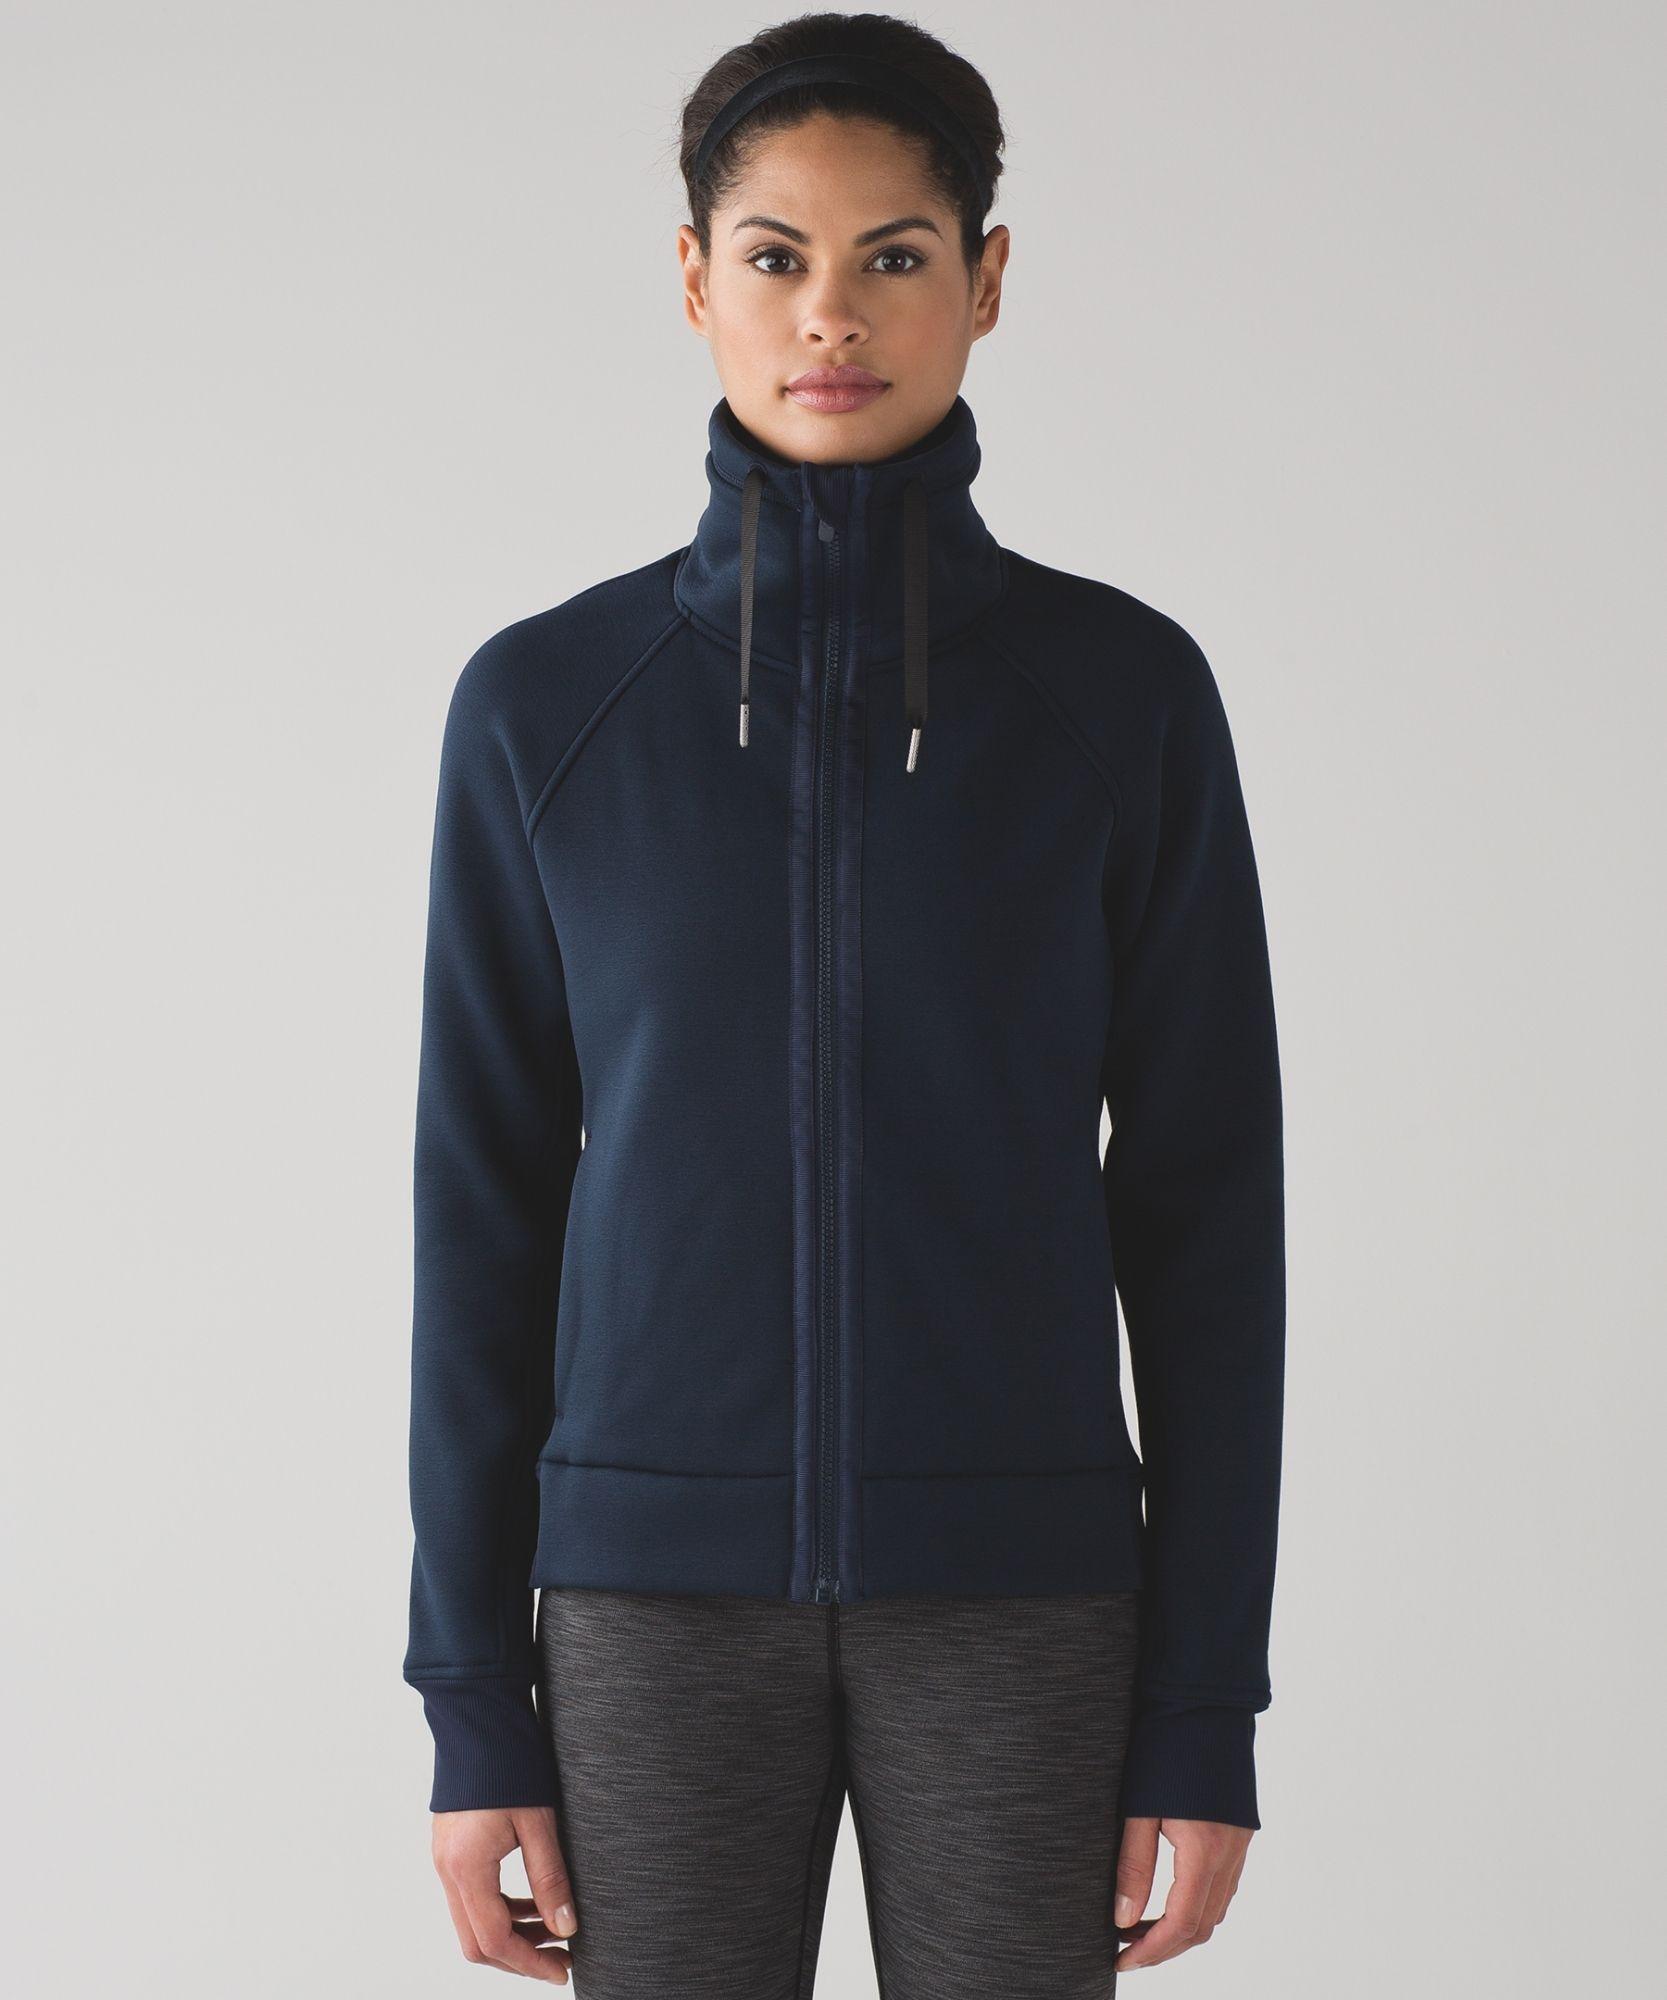 Kick The Cold Jacket Cold Jacket Jackets Outerwear Women [ 2000 x 1667 Pixel ]